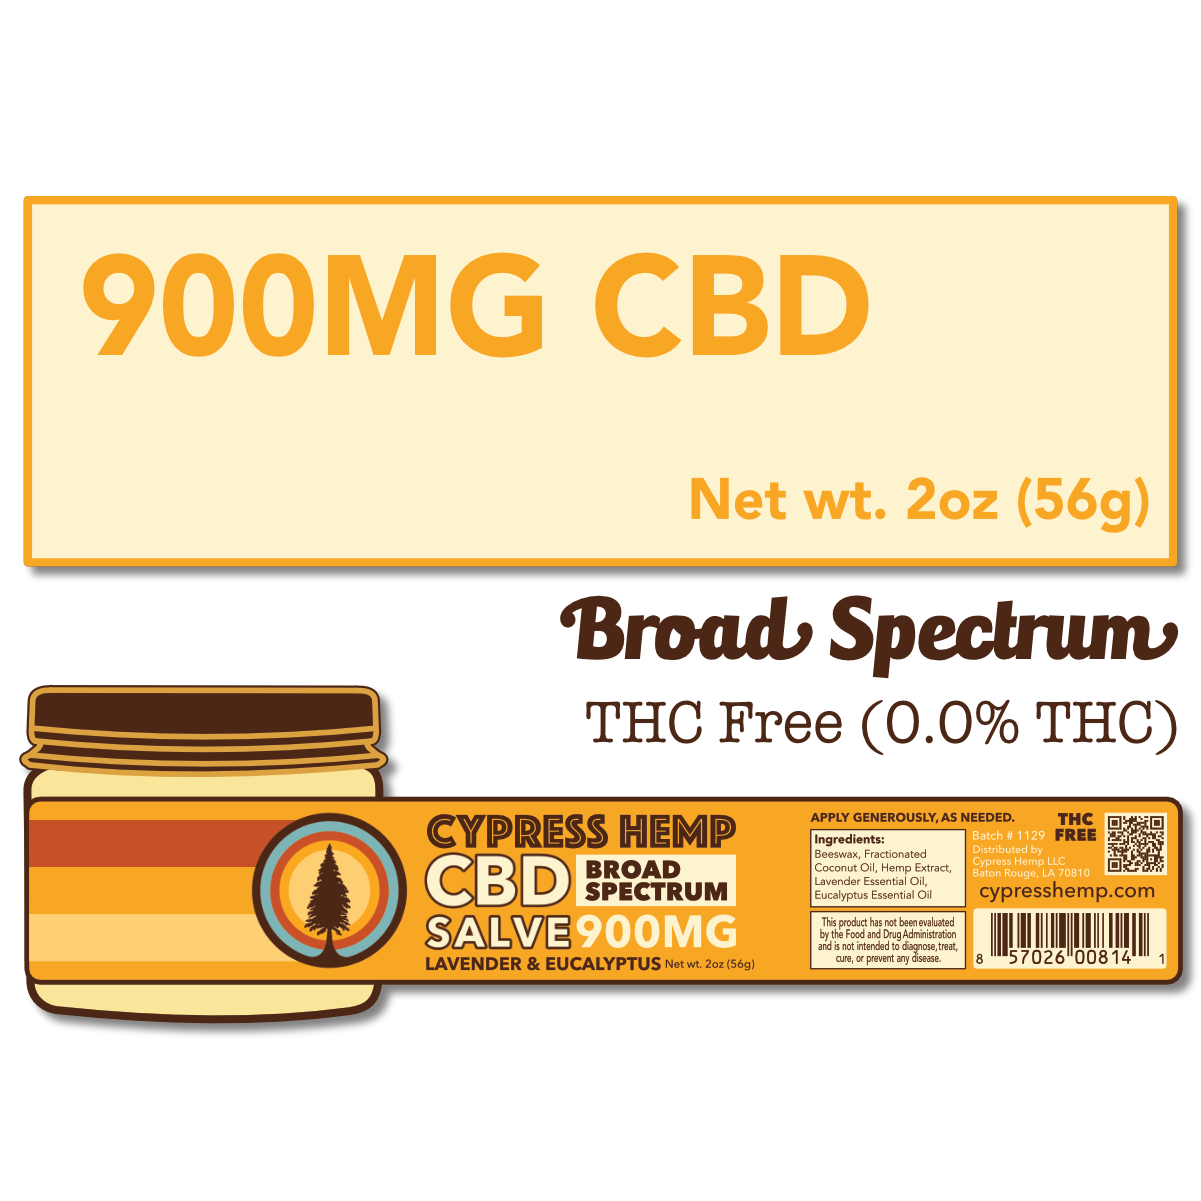 Cypress Hemp Cypress Hemp Broad Spectrum CBD Salve Lavender & Eucalyptus - 900mg